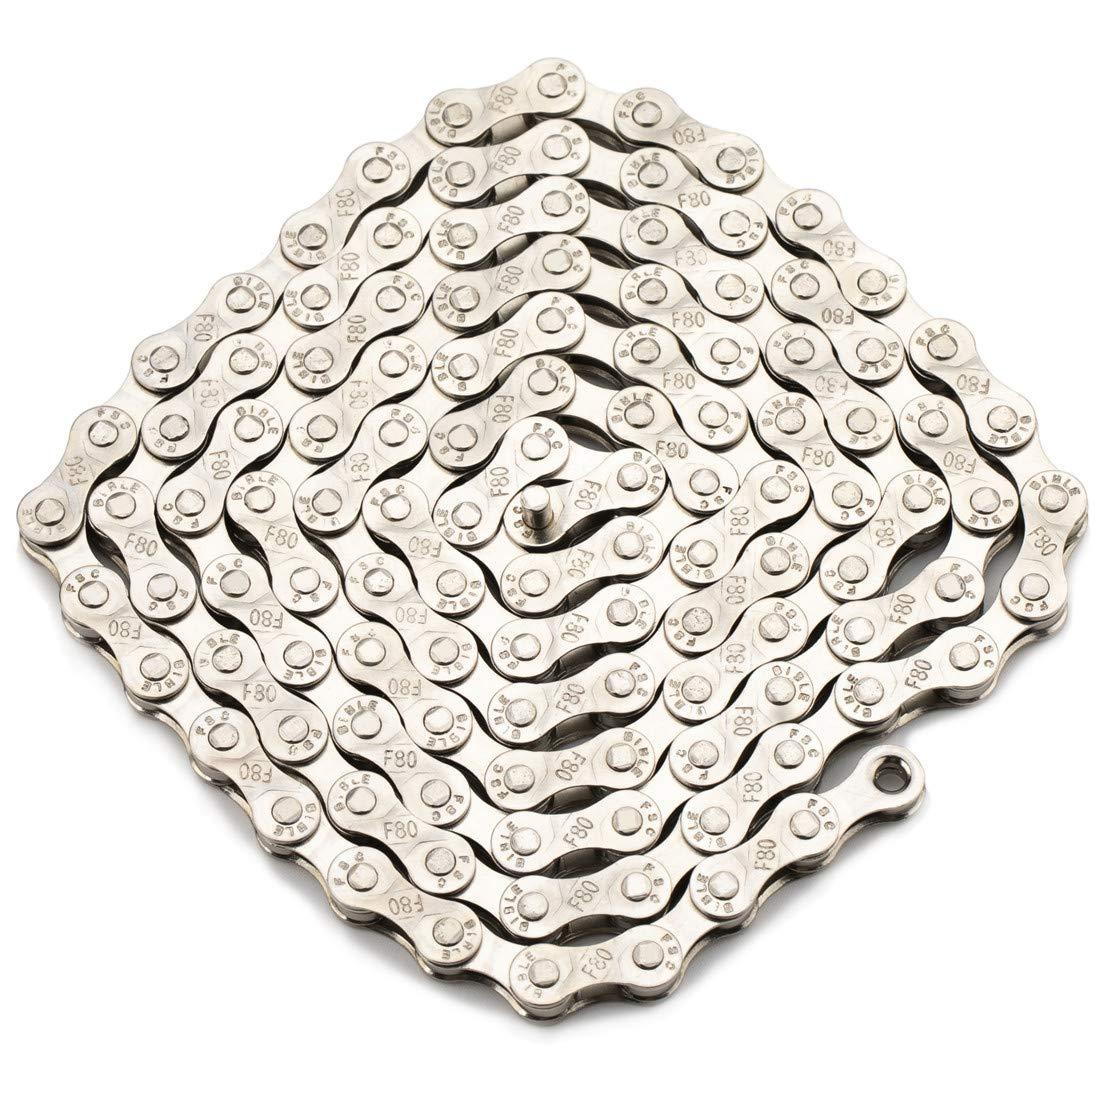 "ZHIQIU FSC 6 7 8 Speeds 116L MTB Bikes Bicycles Chains Silver Gold 1//2/"" x 3//32/"""